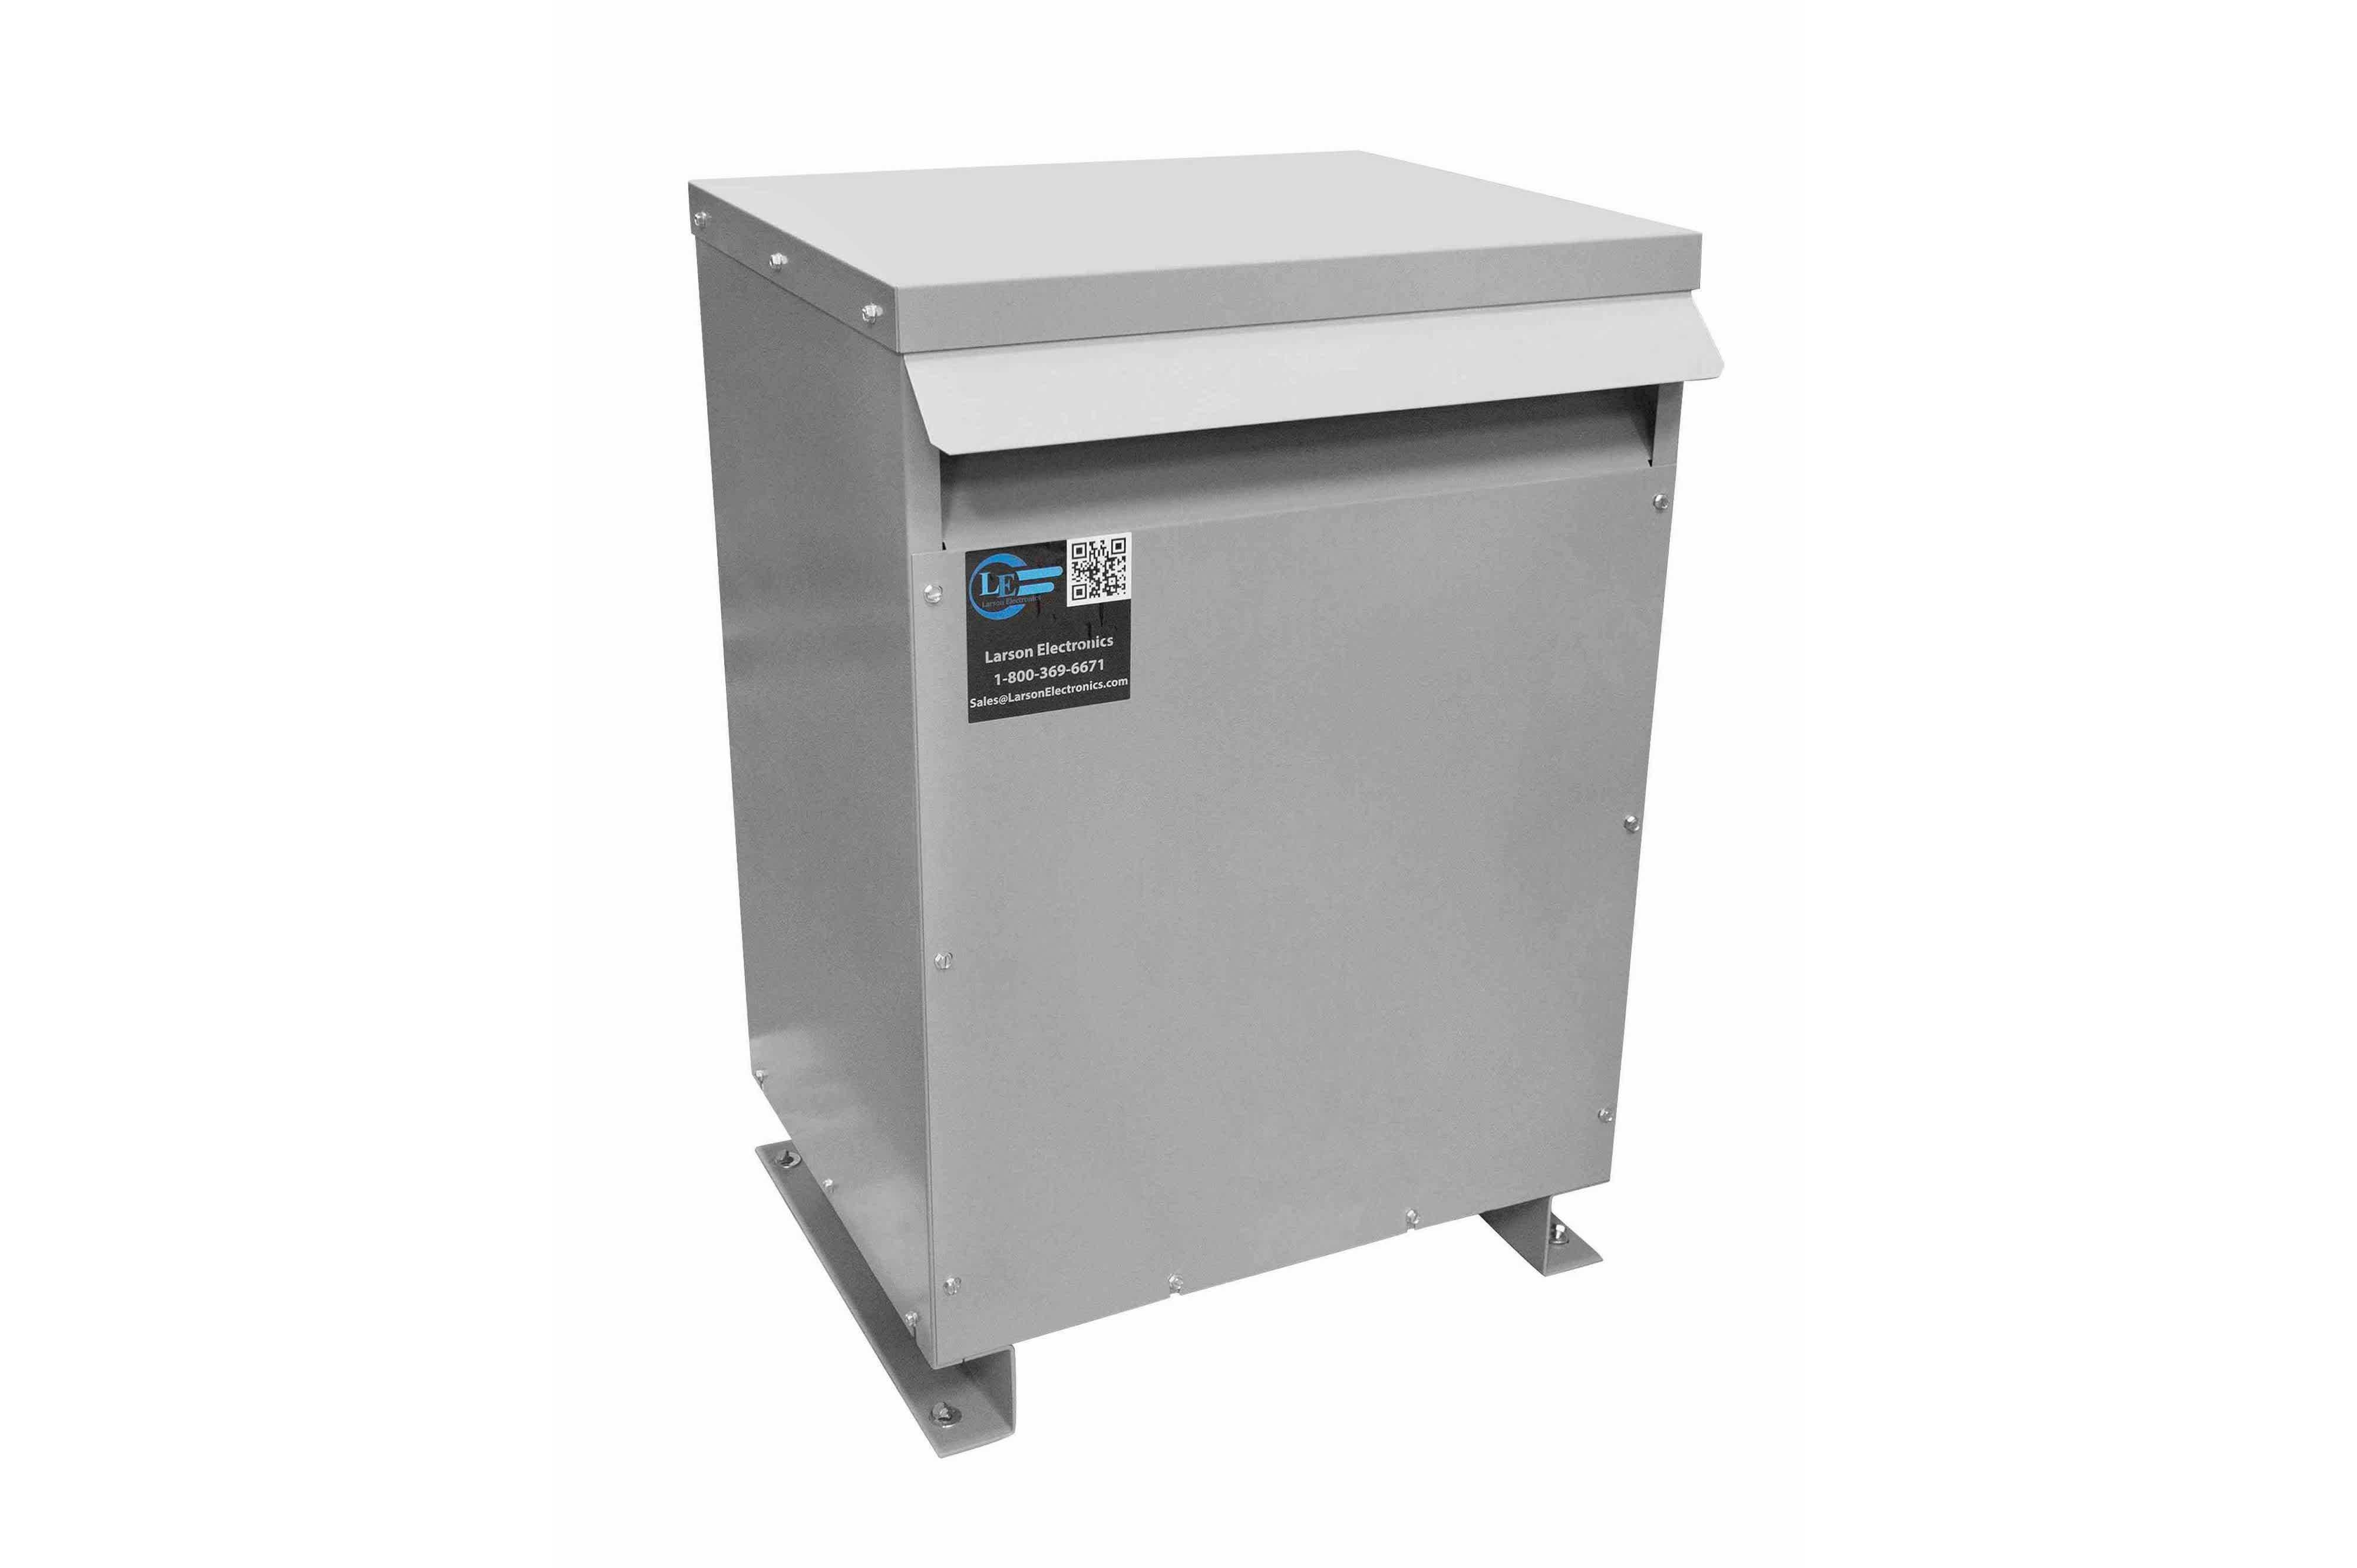 11 kVA 3PH Isolation Transformer, 600V Wye Primary, 480Y/277 Wye-N Secondary, N3R, Ventilated, 60 Hz